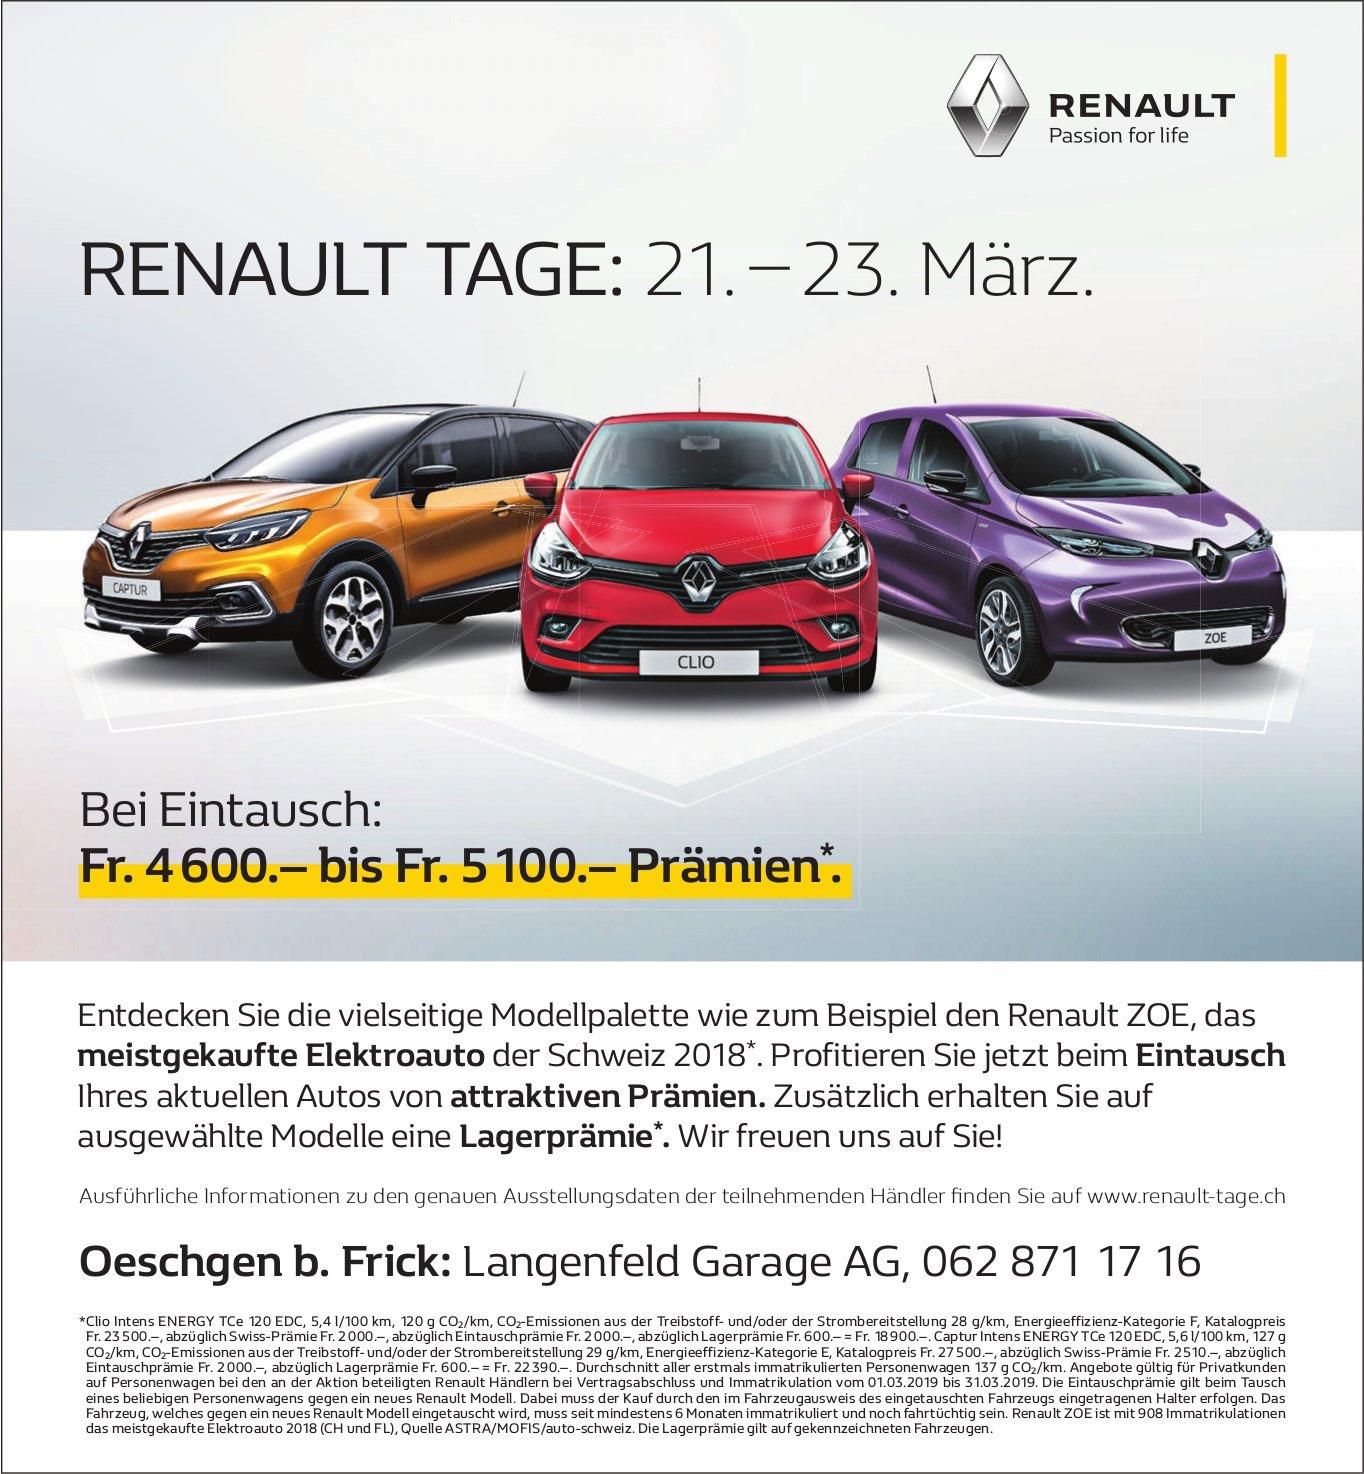 Langenfeld Garage AG, Oeschgen b. Frick - RENAULT TAGE: 21. – 23. März.